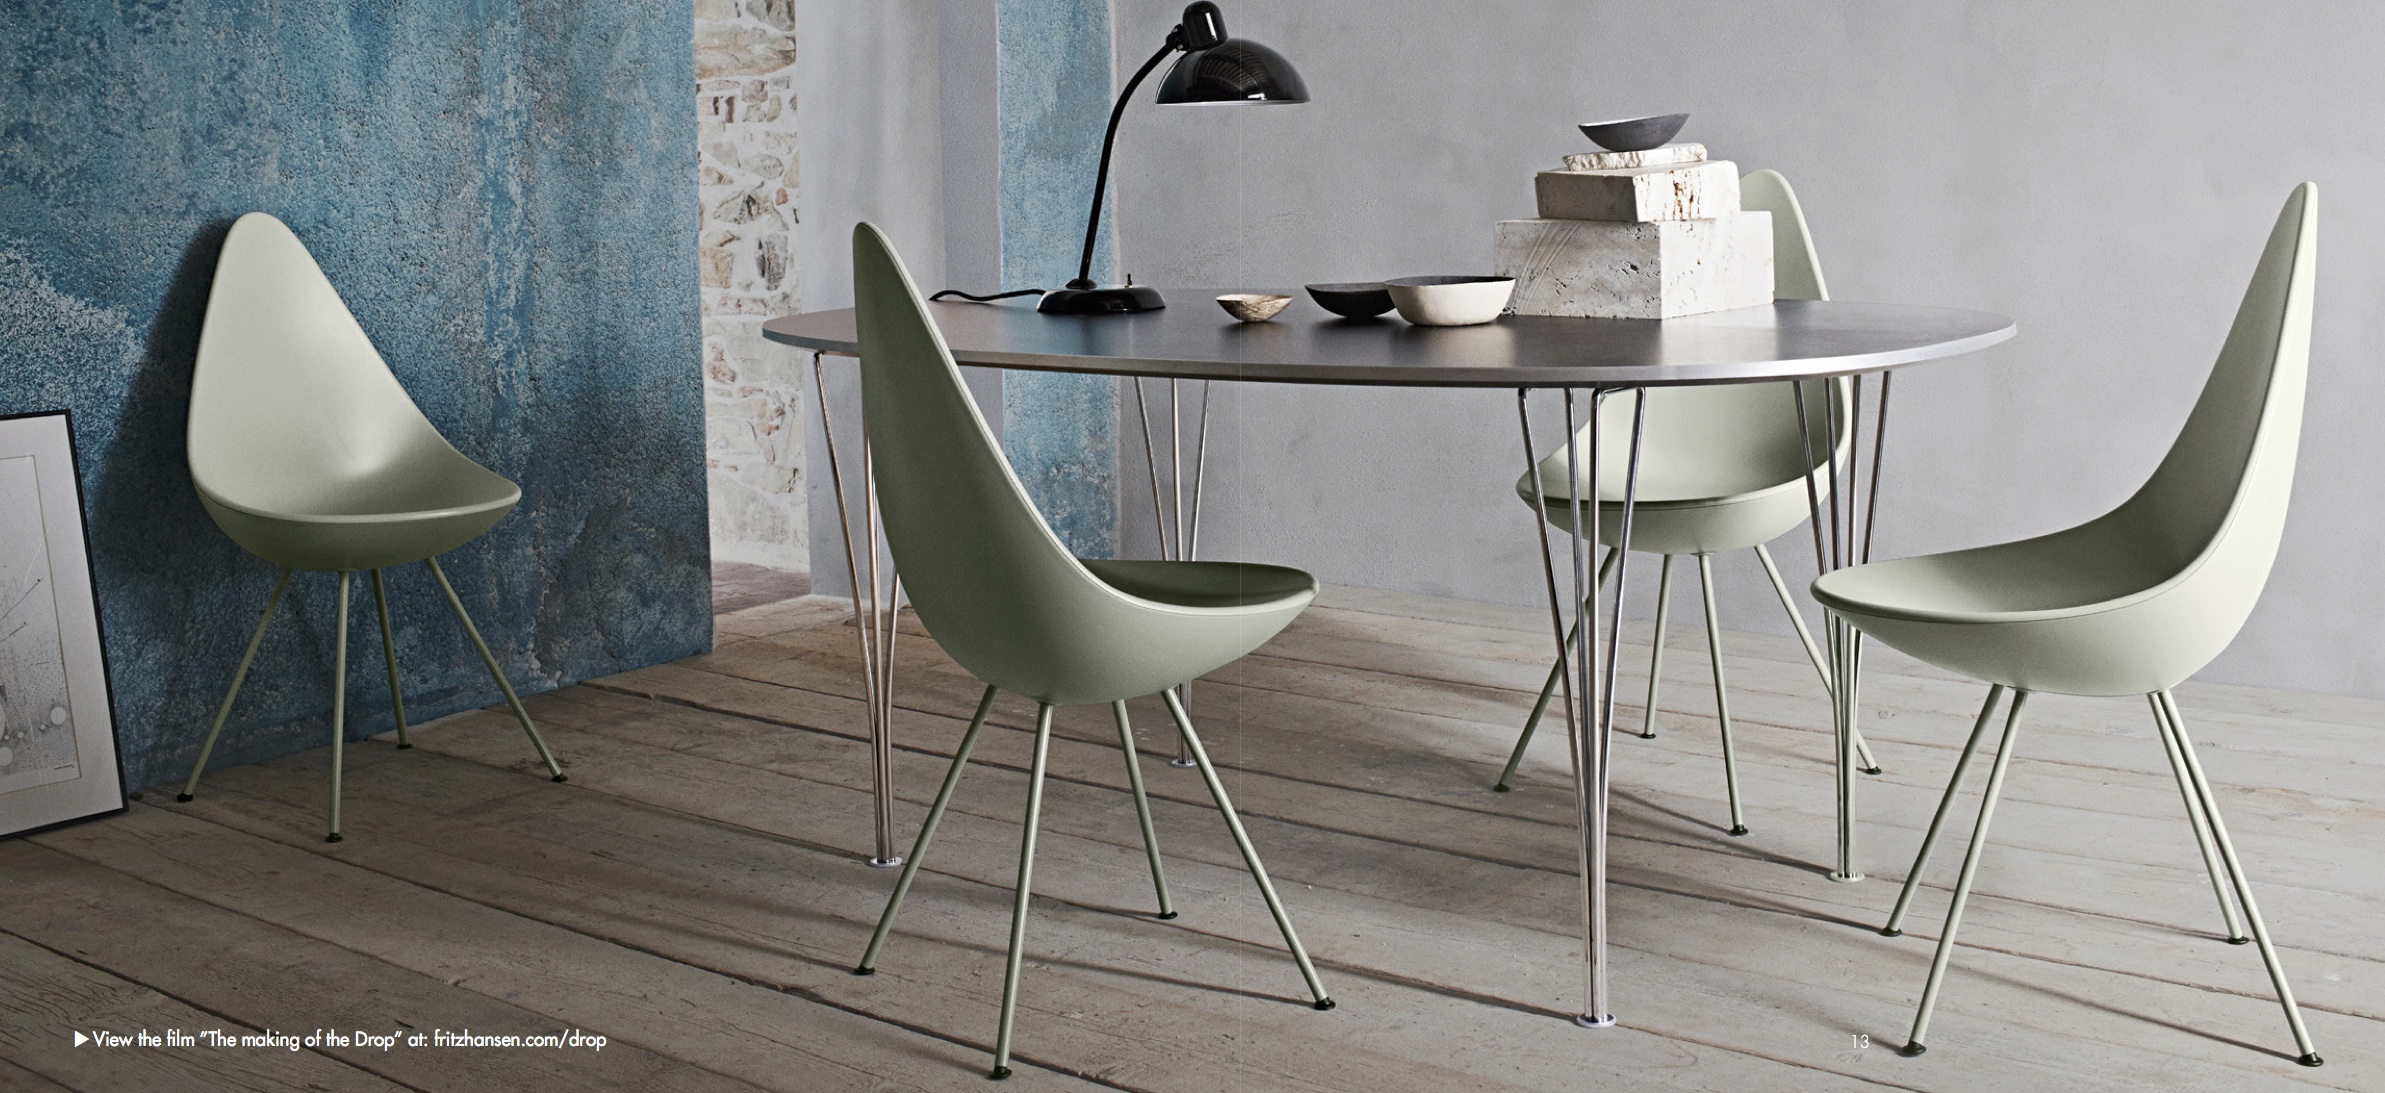 Arne jacobsen drop chair - Drop Chair By Arne Jacobesen